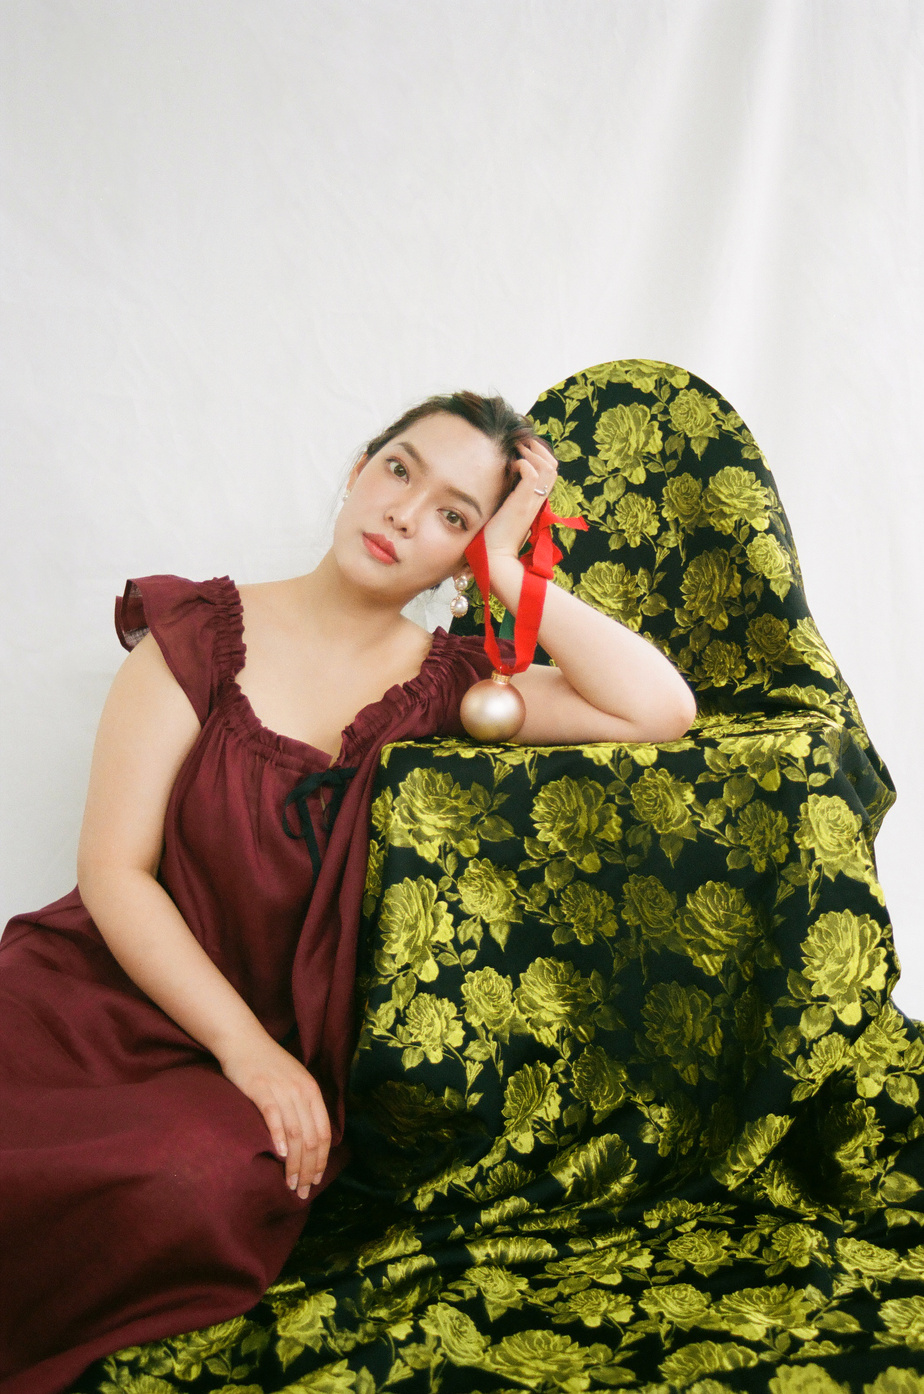 La Party Nightie d'Eliza Faulkner + The Sleep Shirt en lin bordeaux